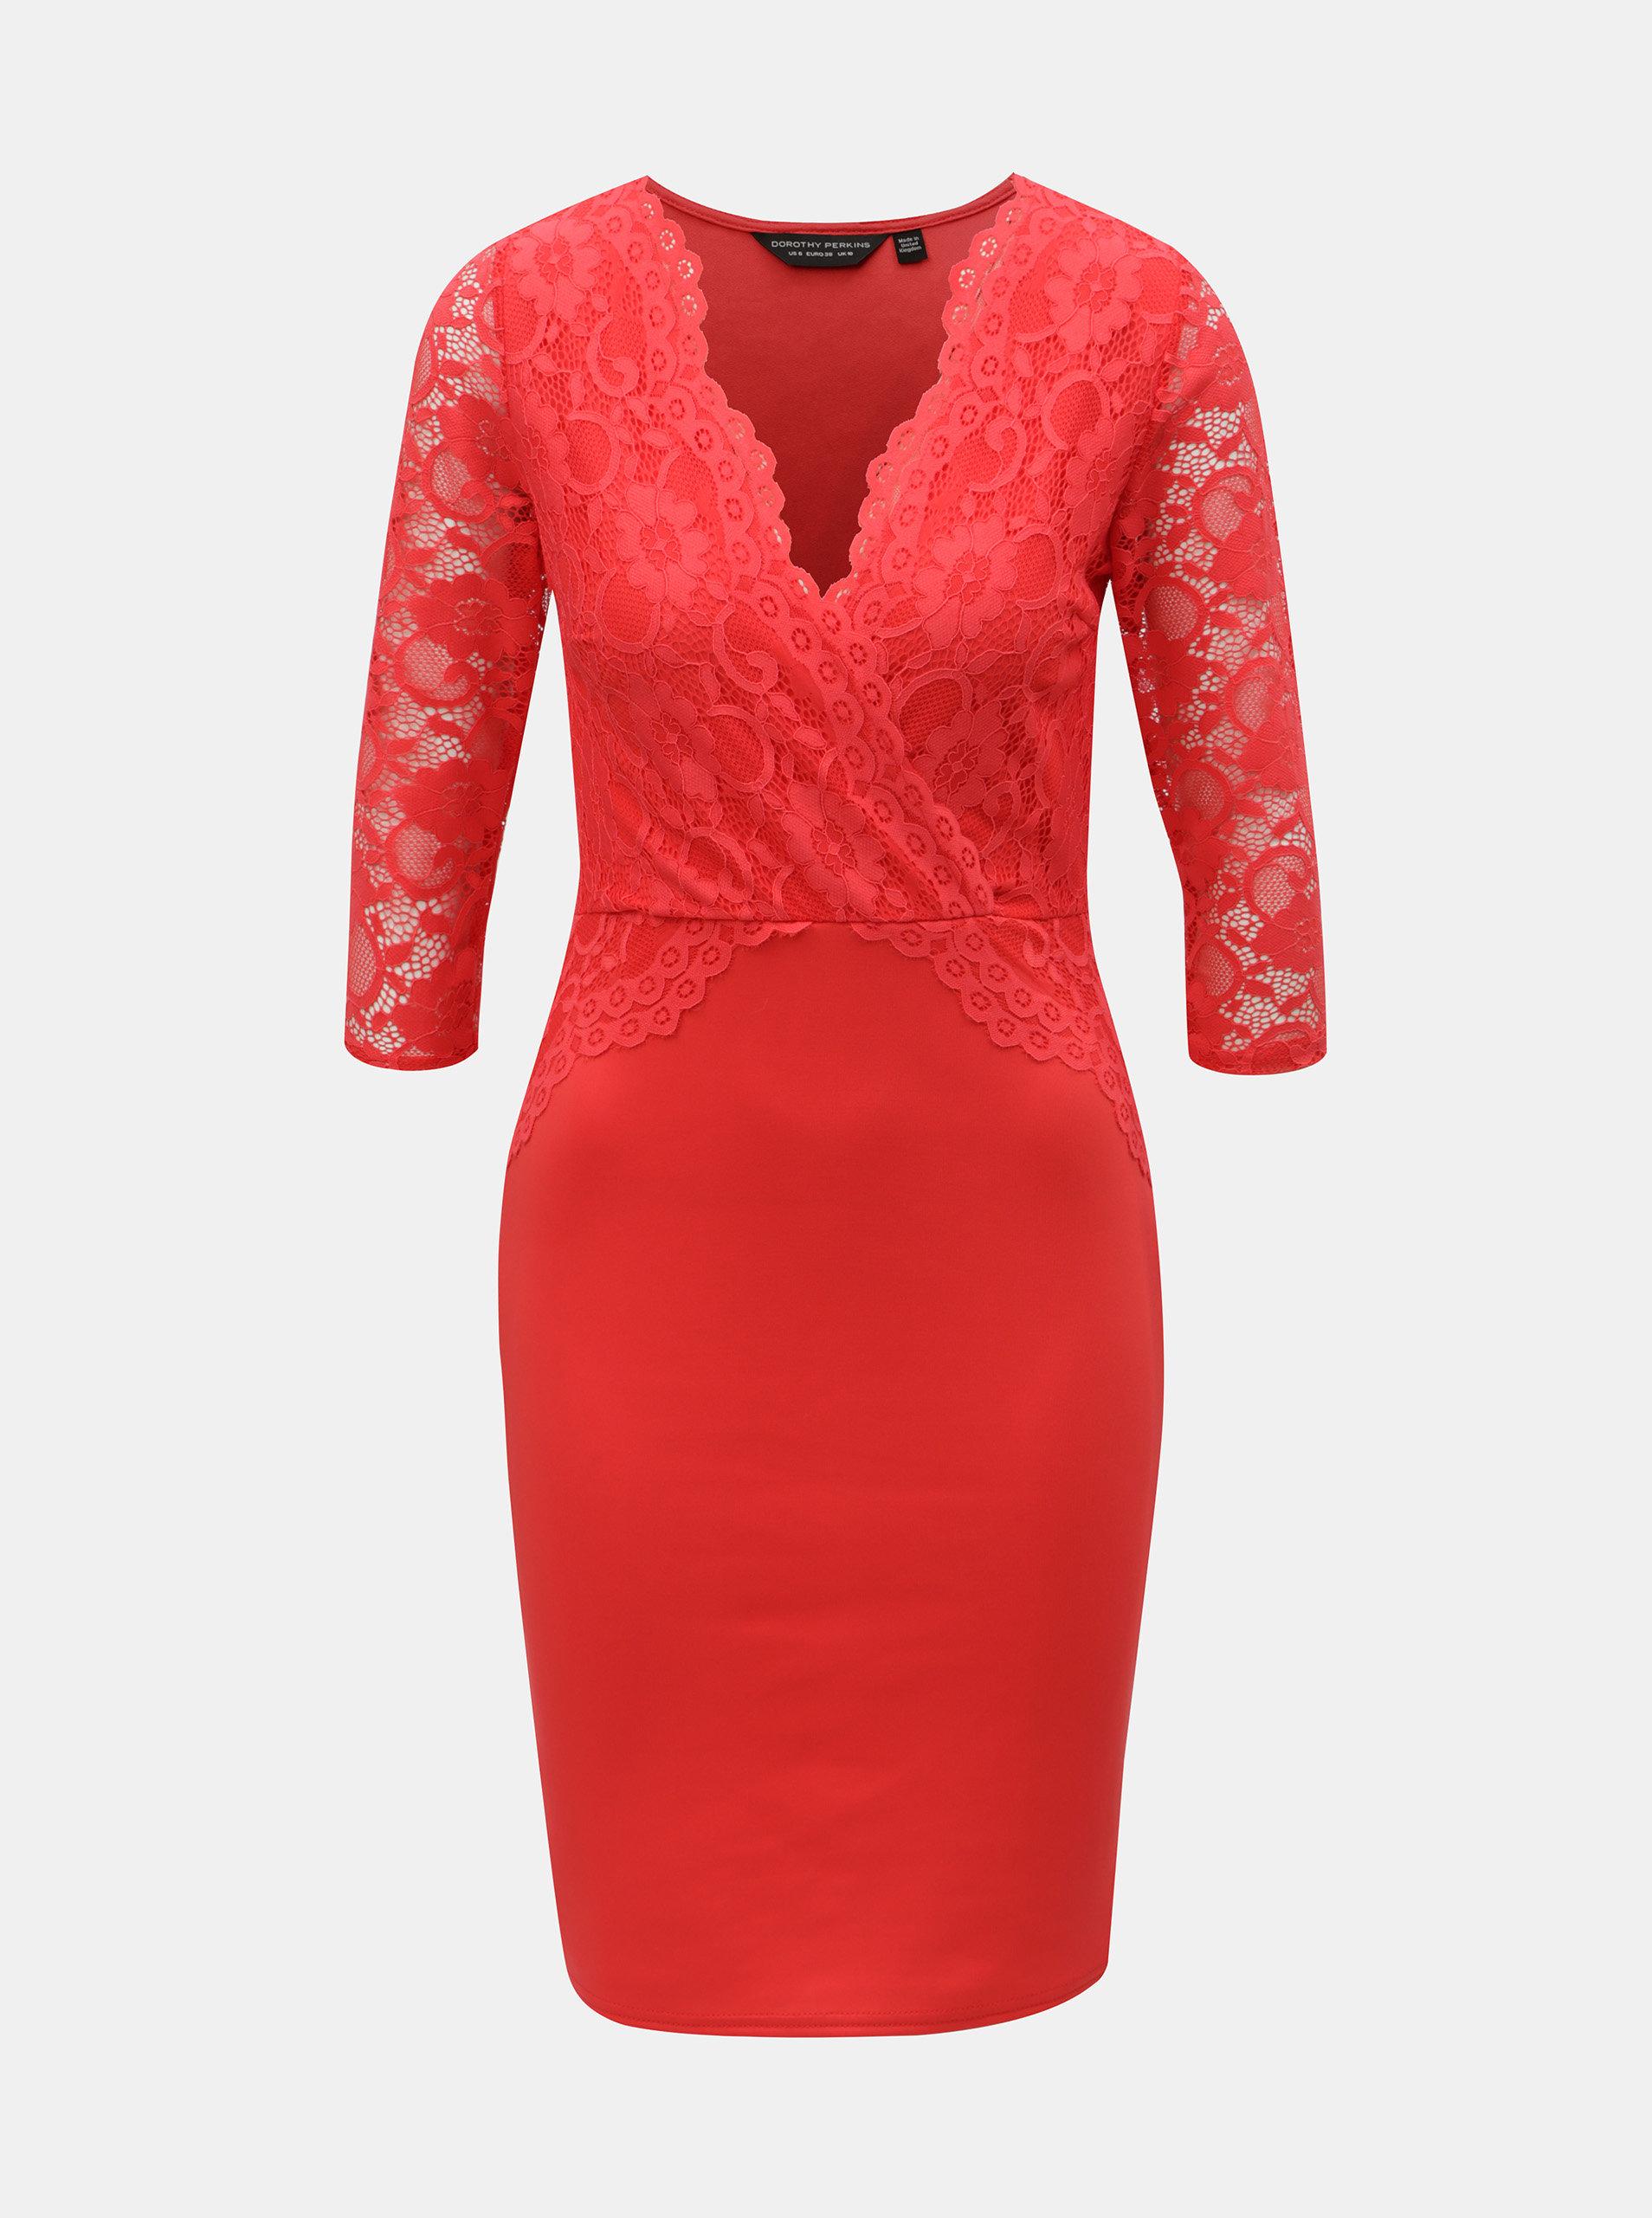 9afdfa37538b Červené puzdrové šaty s čipkou Dorothy Perkins ...